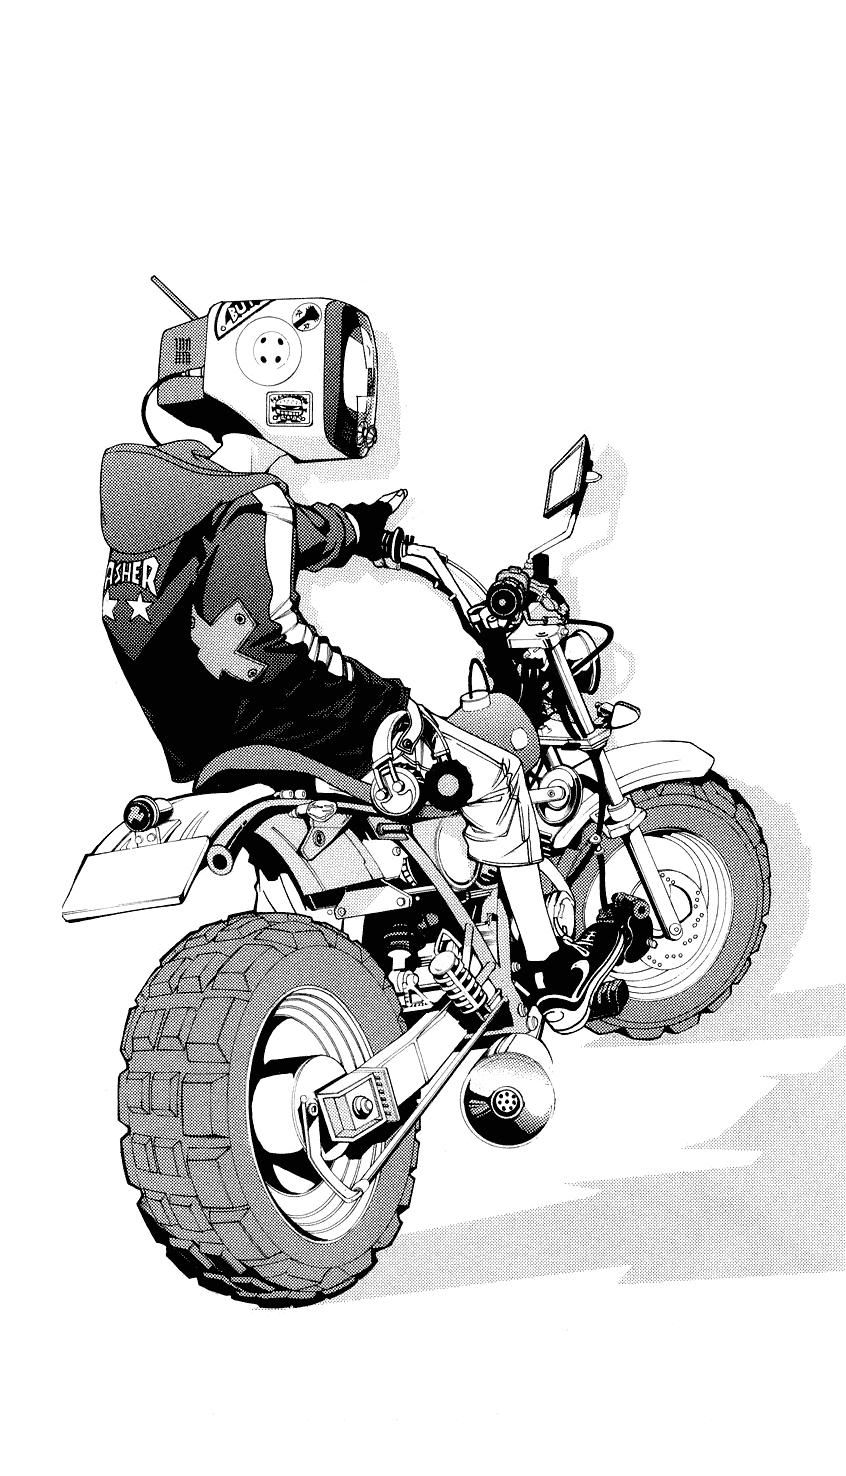 DJ Plugman from Air Gear manga art by Ito Ōgure also